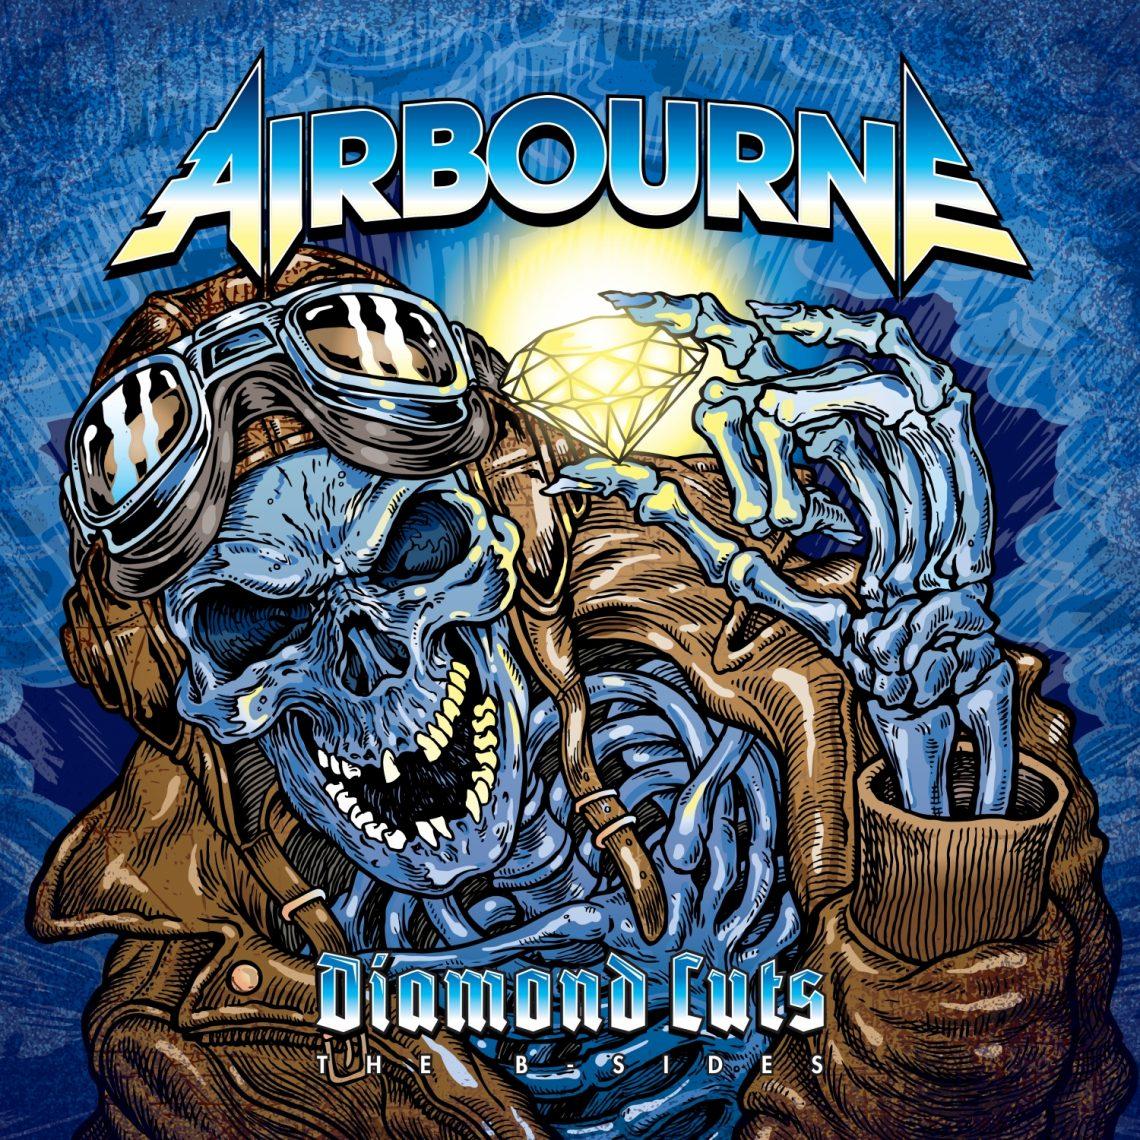 Airbourne – Diamond Cuts Album Review